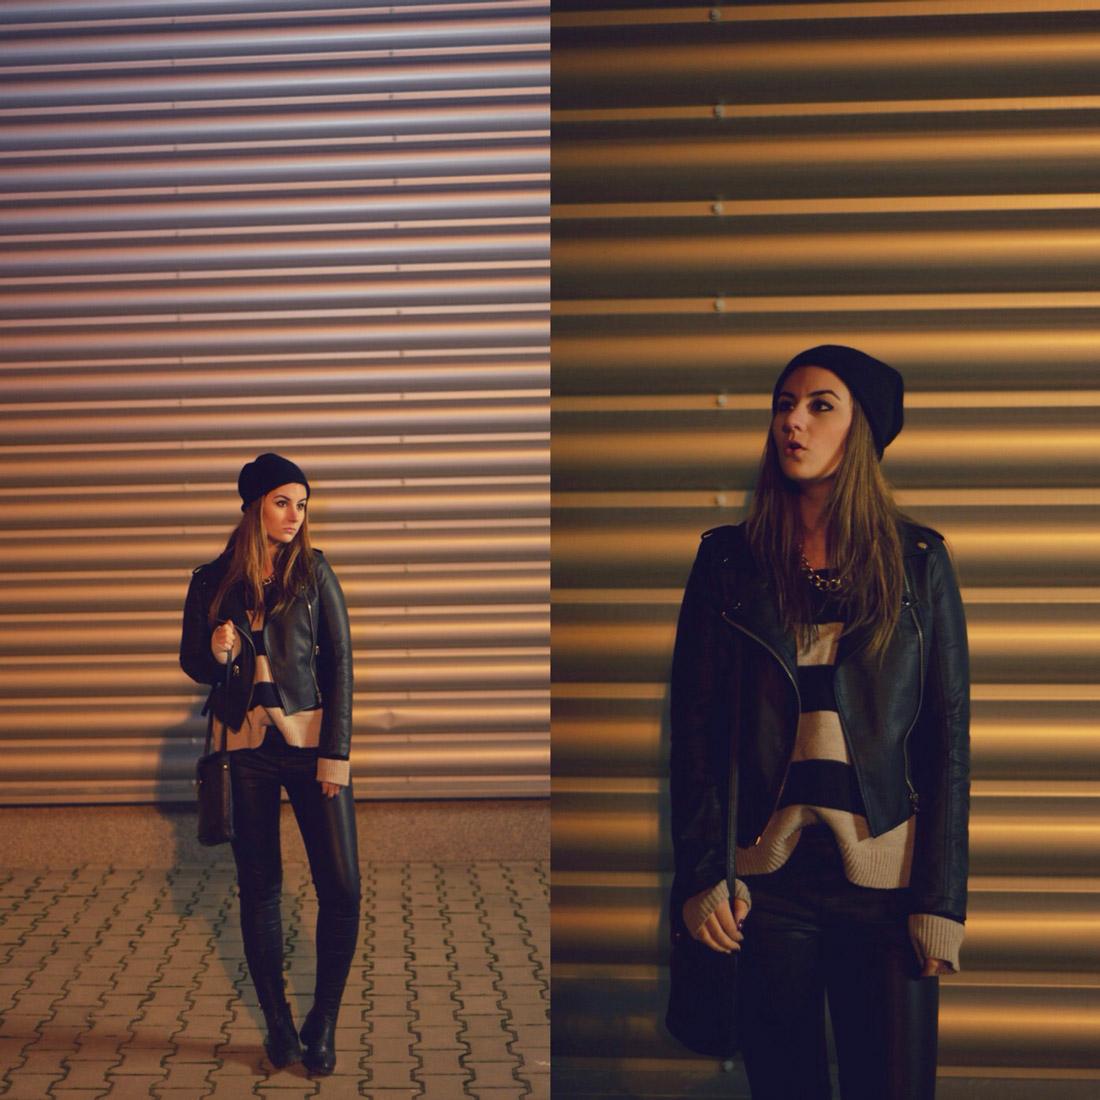 Tinuta rock geaca din piele stree style urban iulia andrei fashion blog